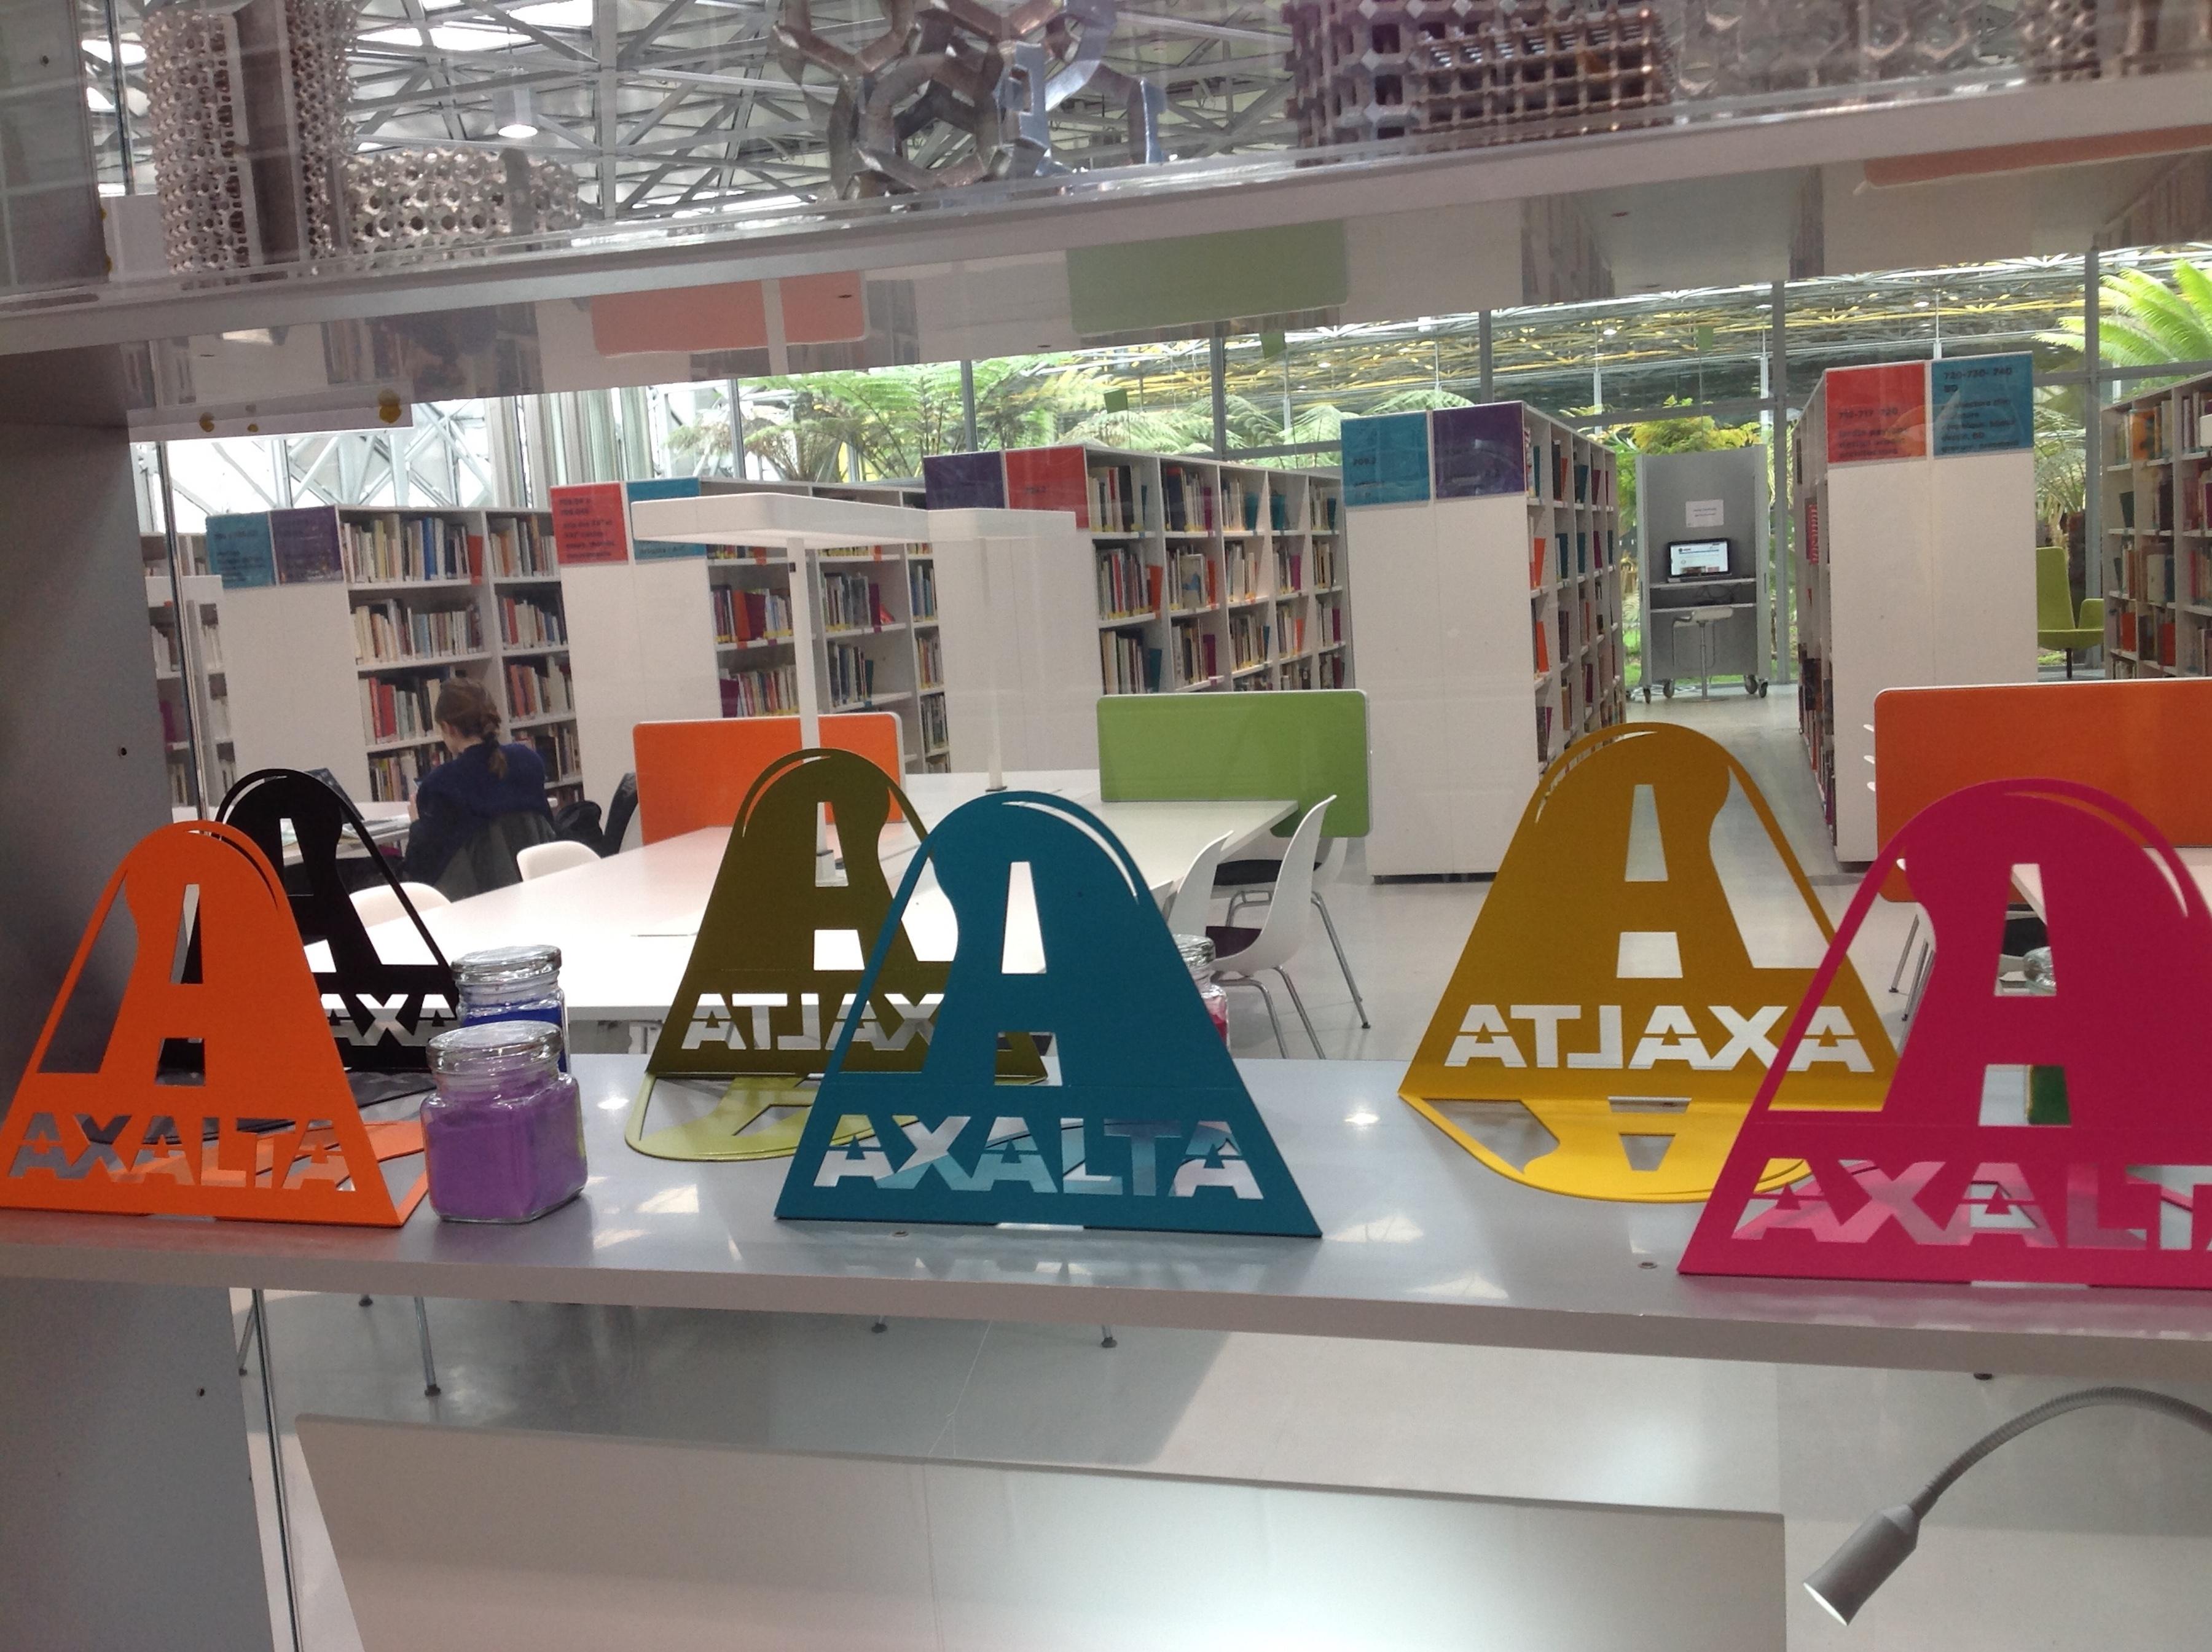 Axalta's Alesta® powder coatings on display at the 10th International Biennale Design Event in France. (Photo: Axalta)